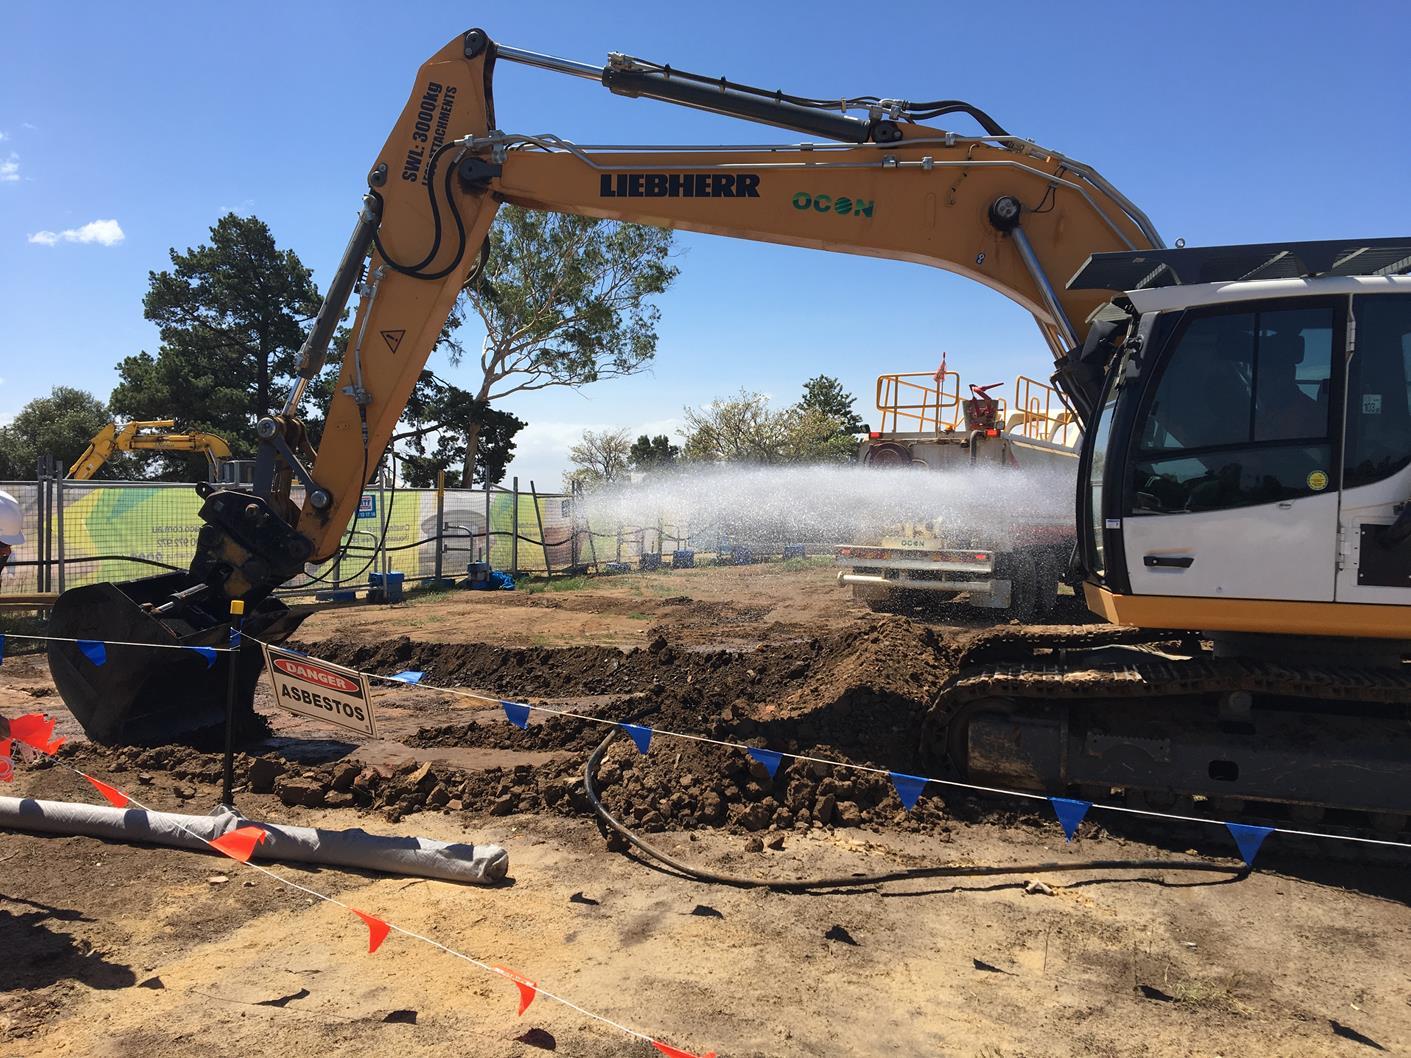 OCON Services bulk material excavator loader